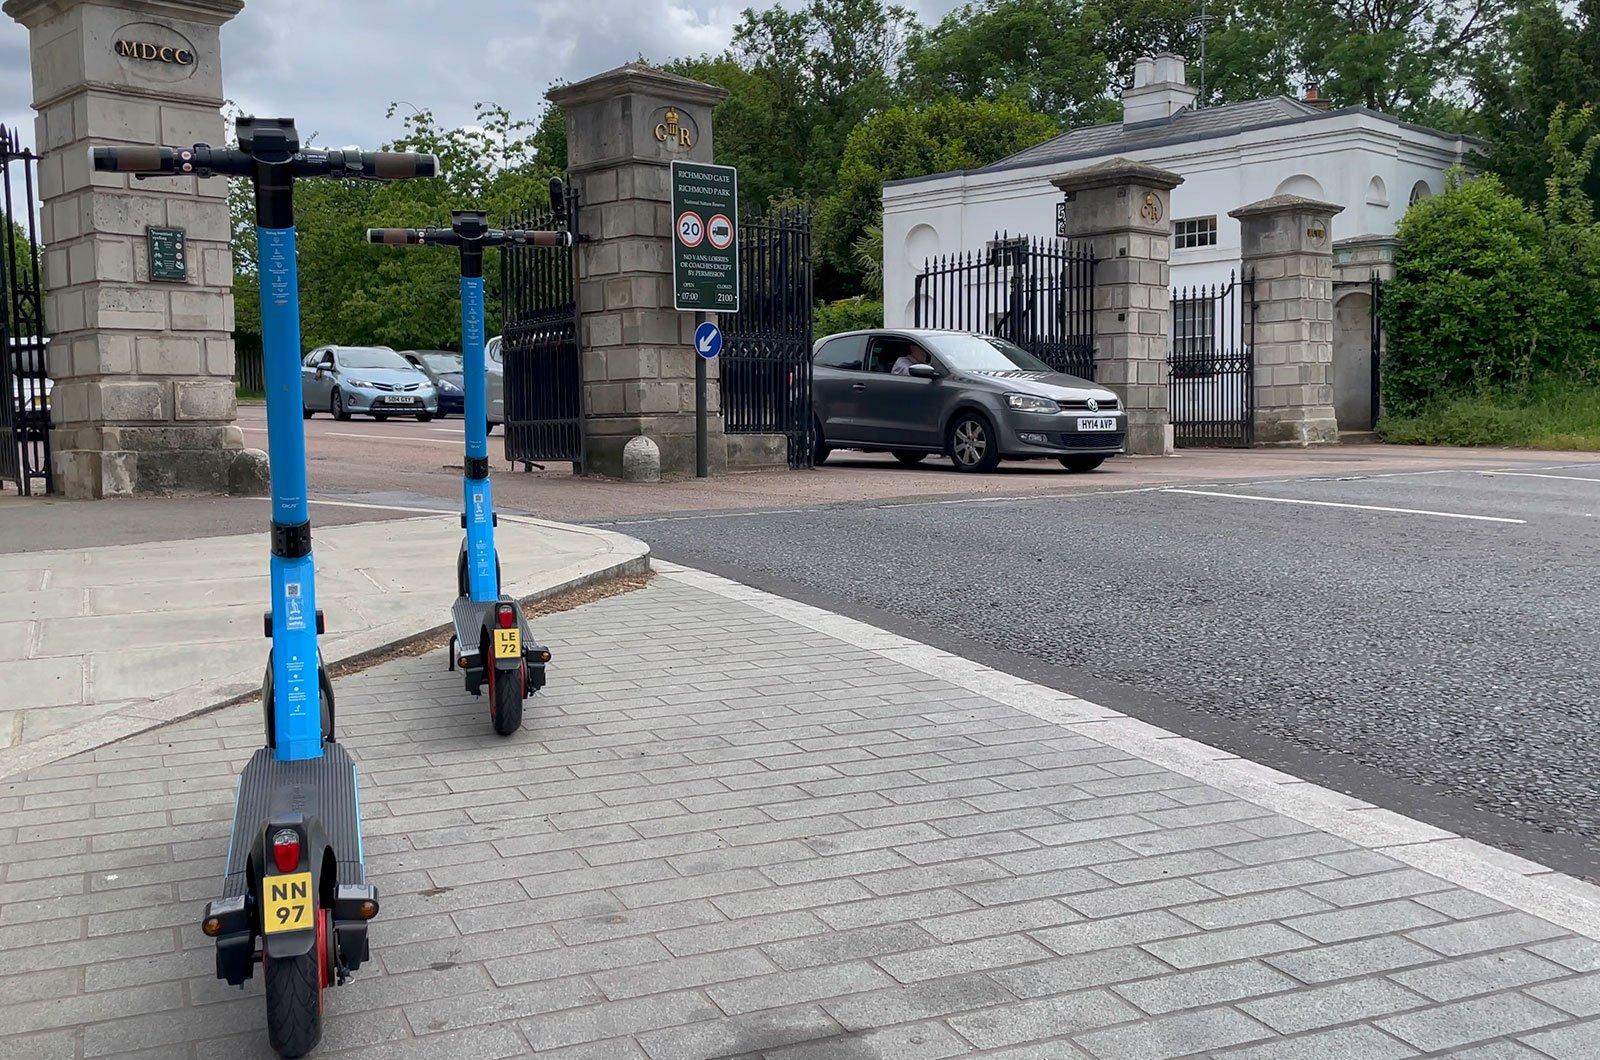 e-scooter outside Richmond Park